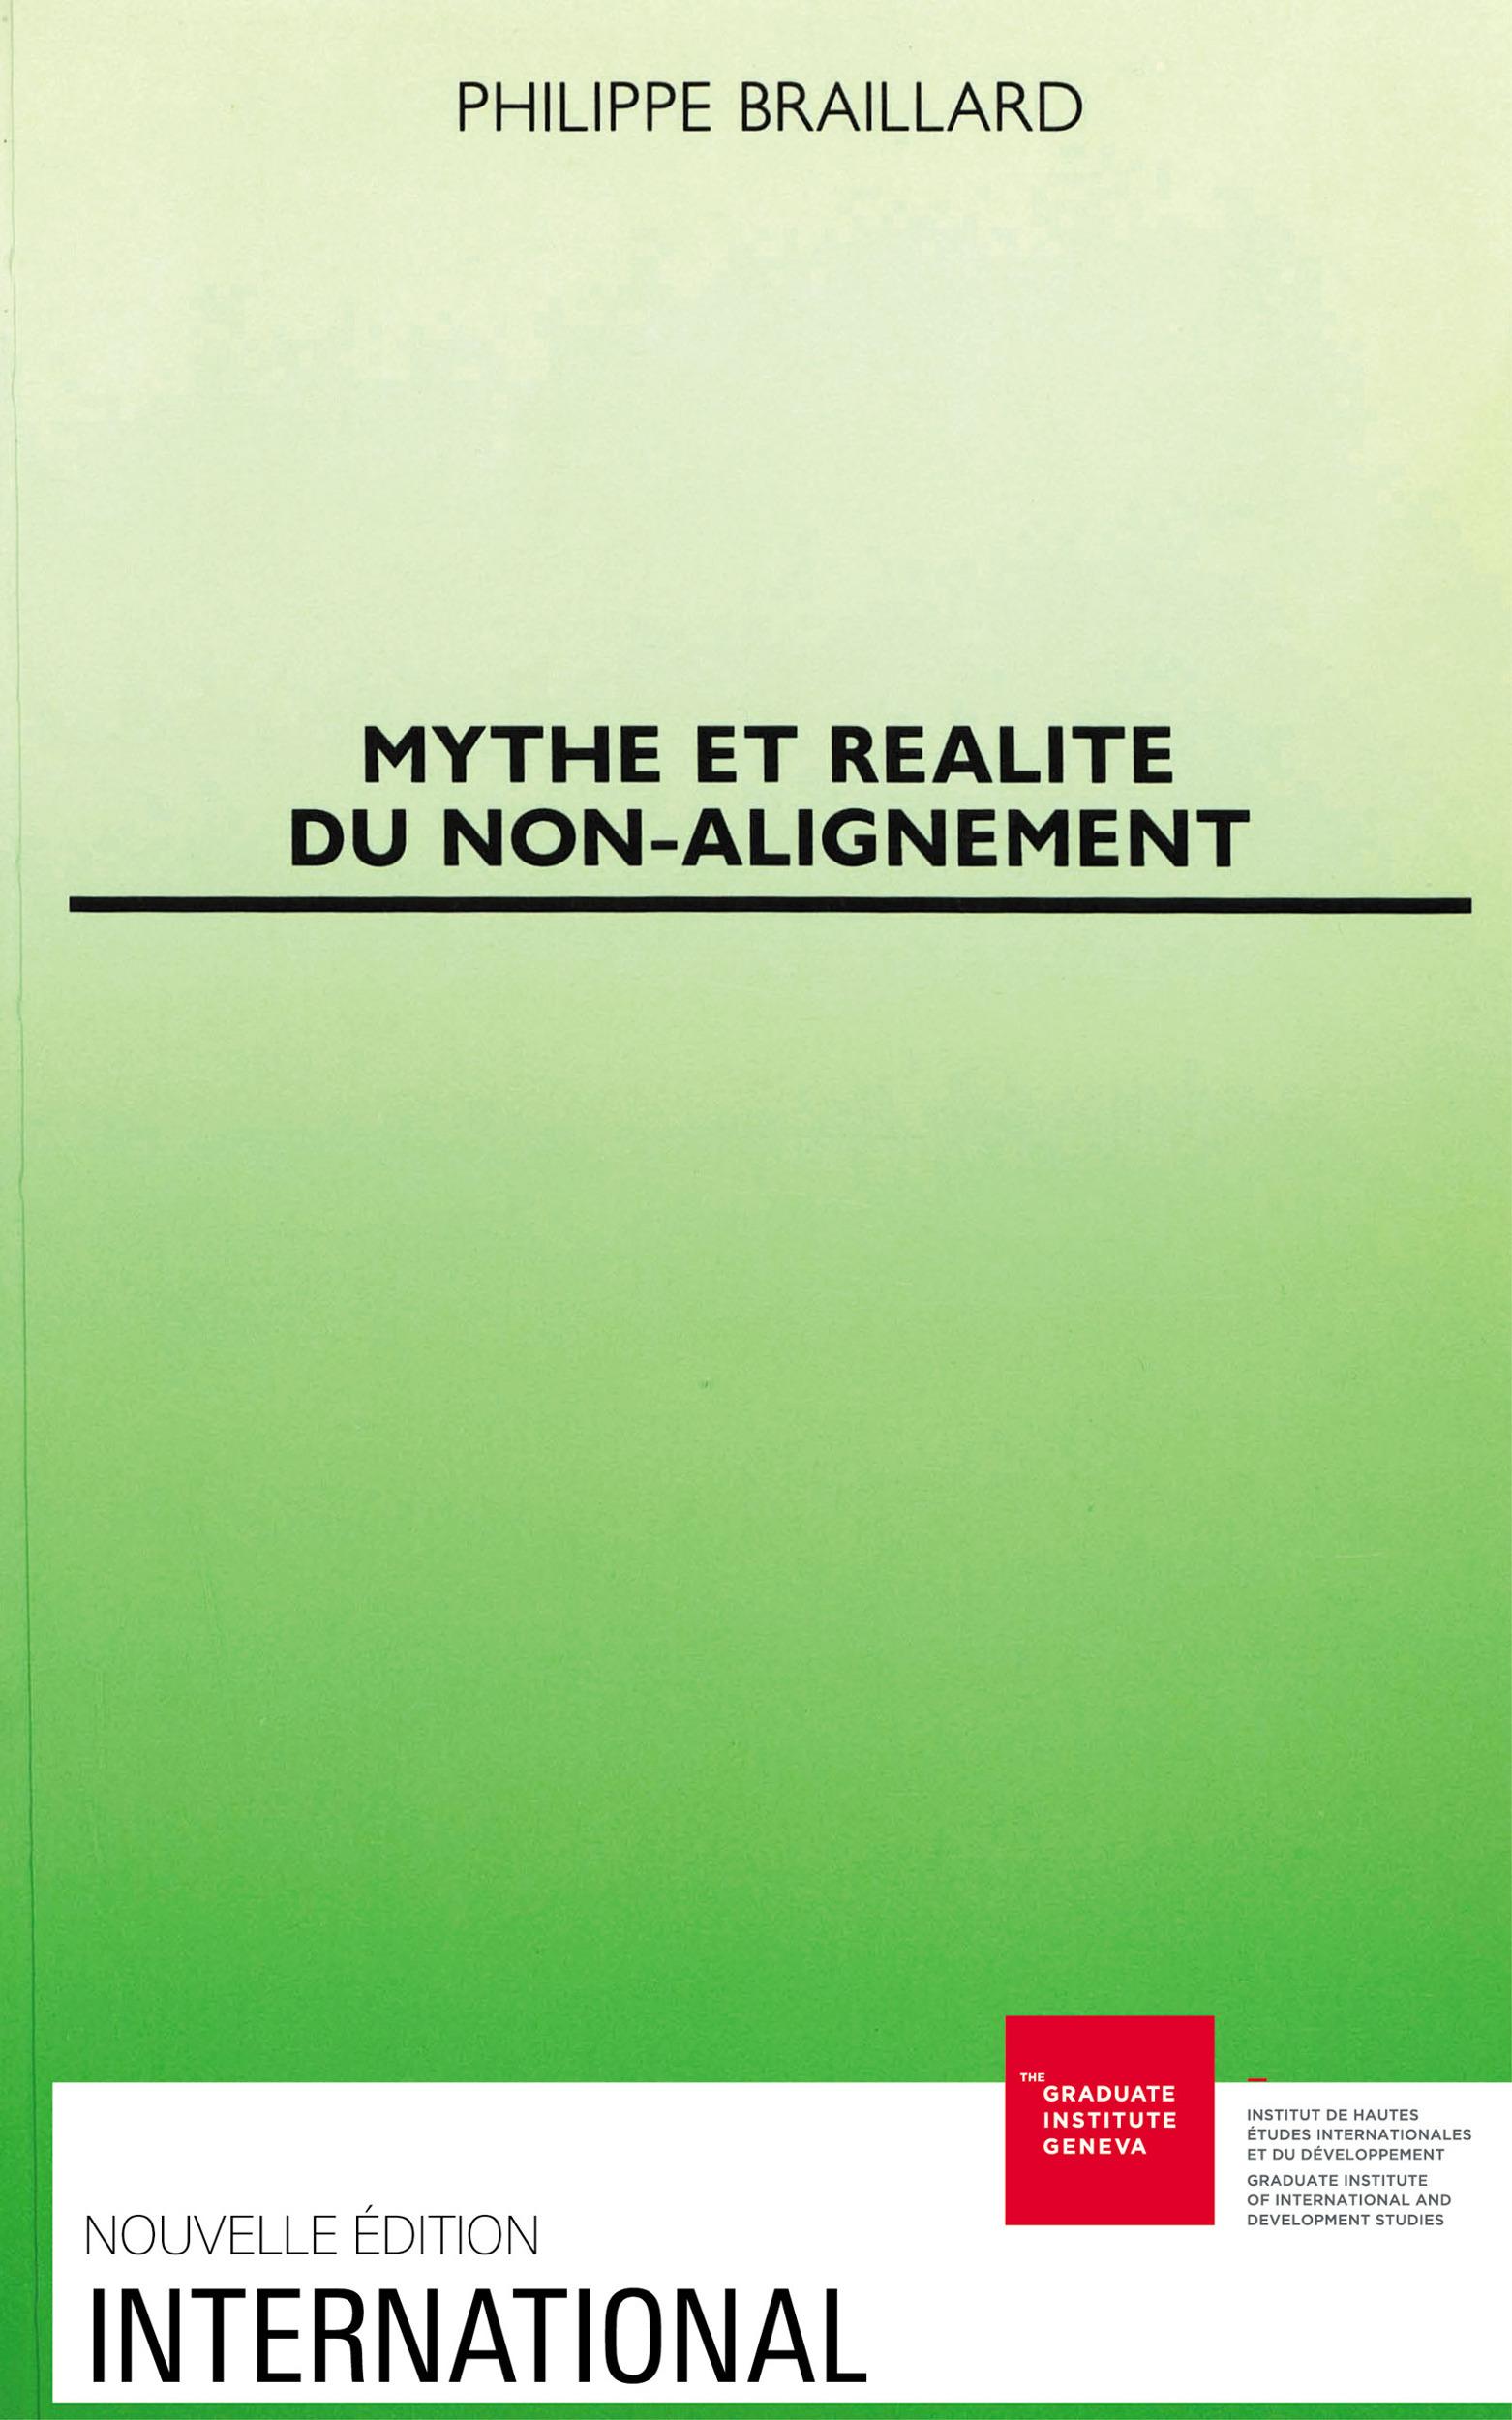 Mythe et realite du non-alignement